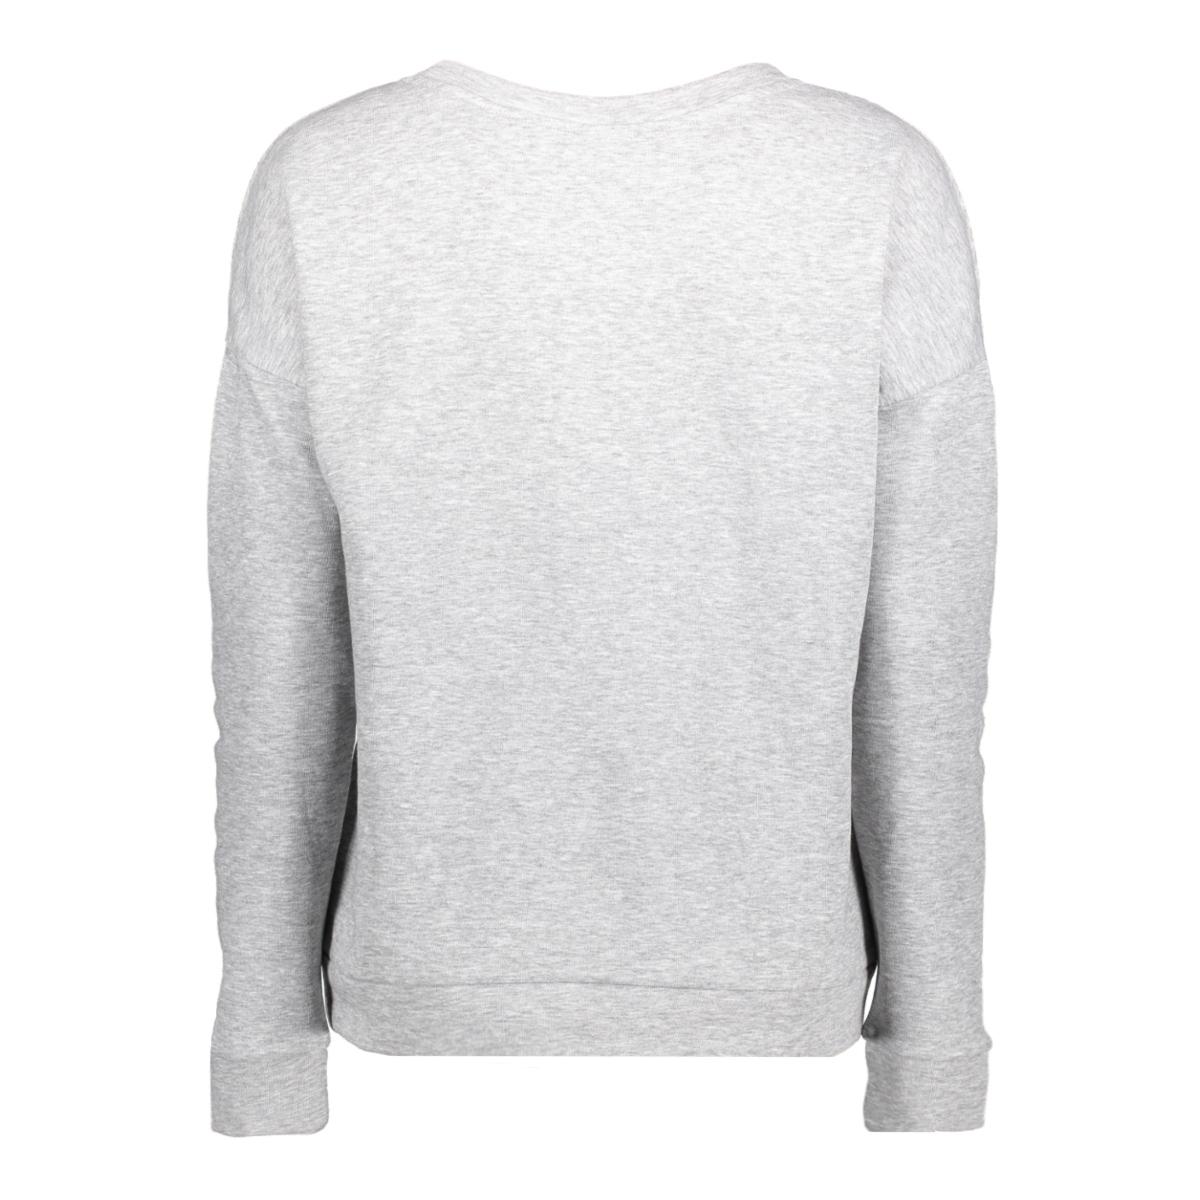 jdytori l/s print sweat 11 swt 15140959 jacqueline de yong sweater light grey mela/untranslat